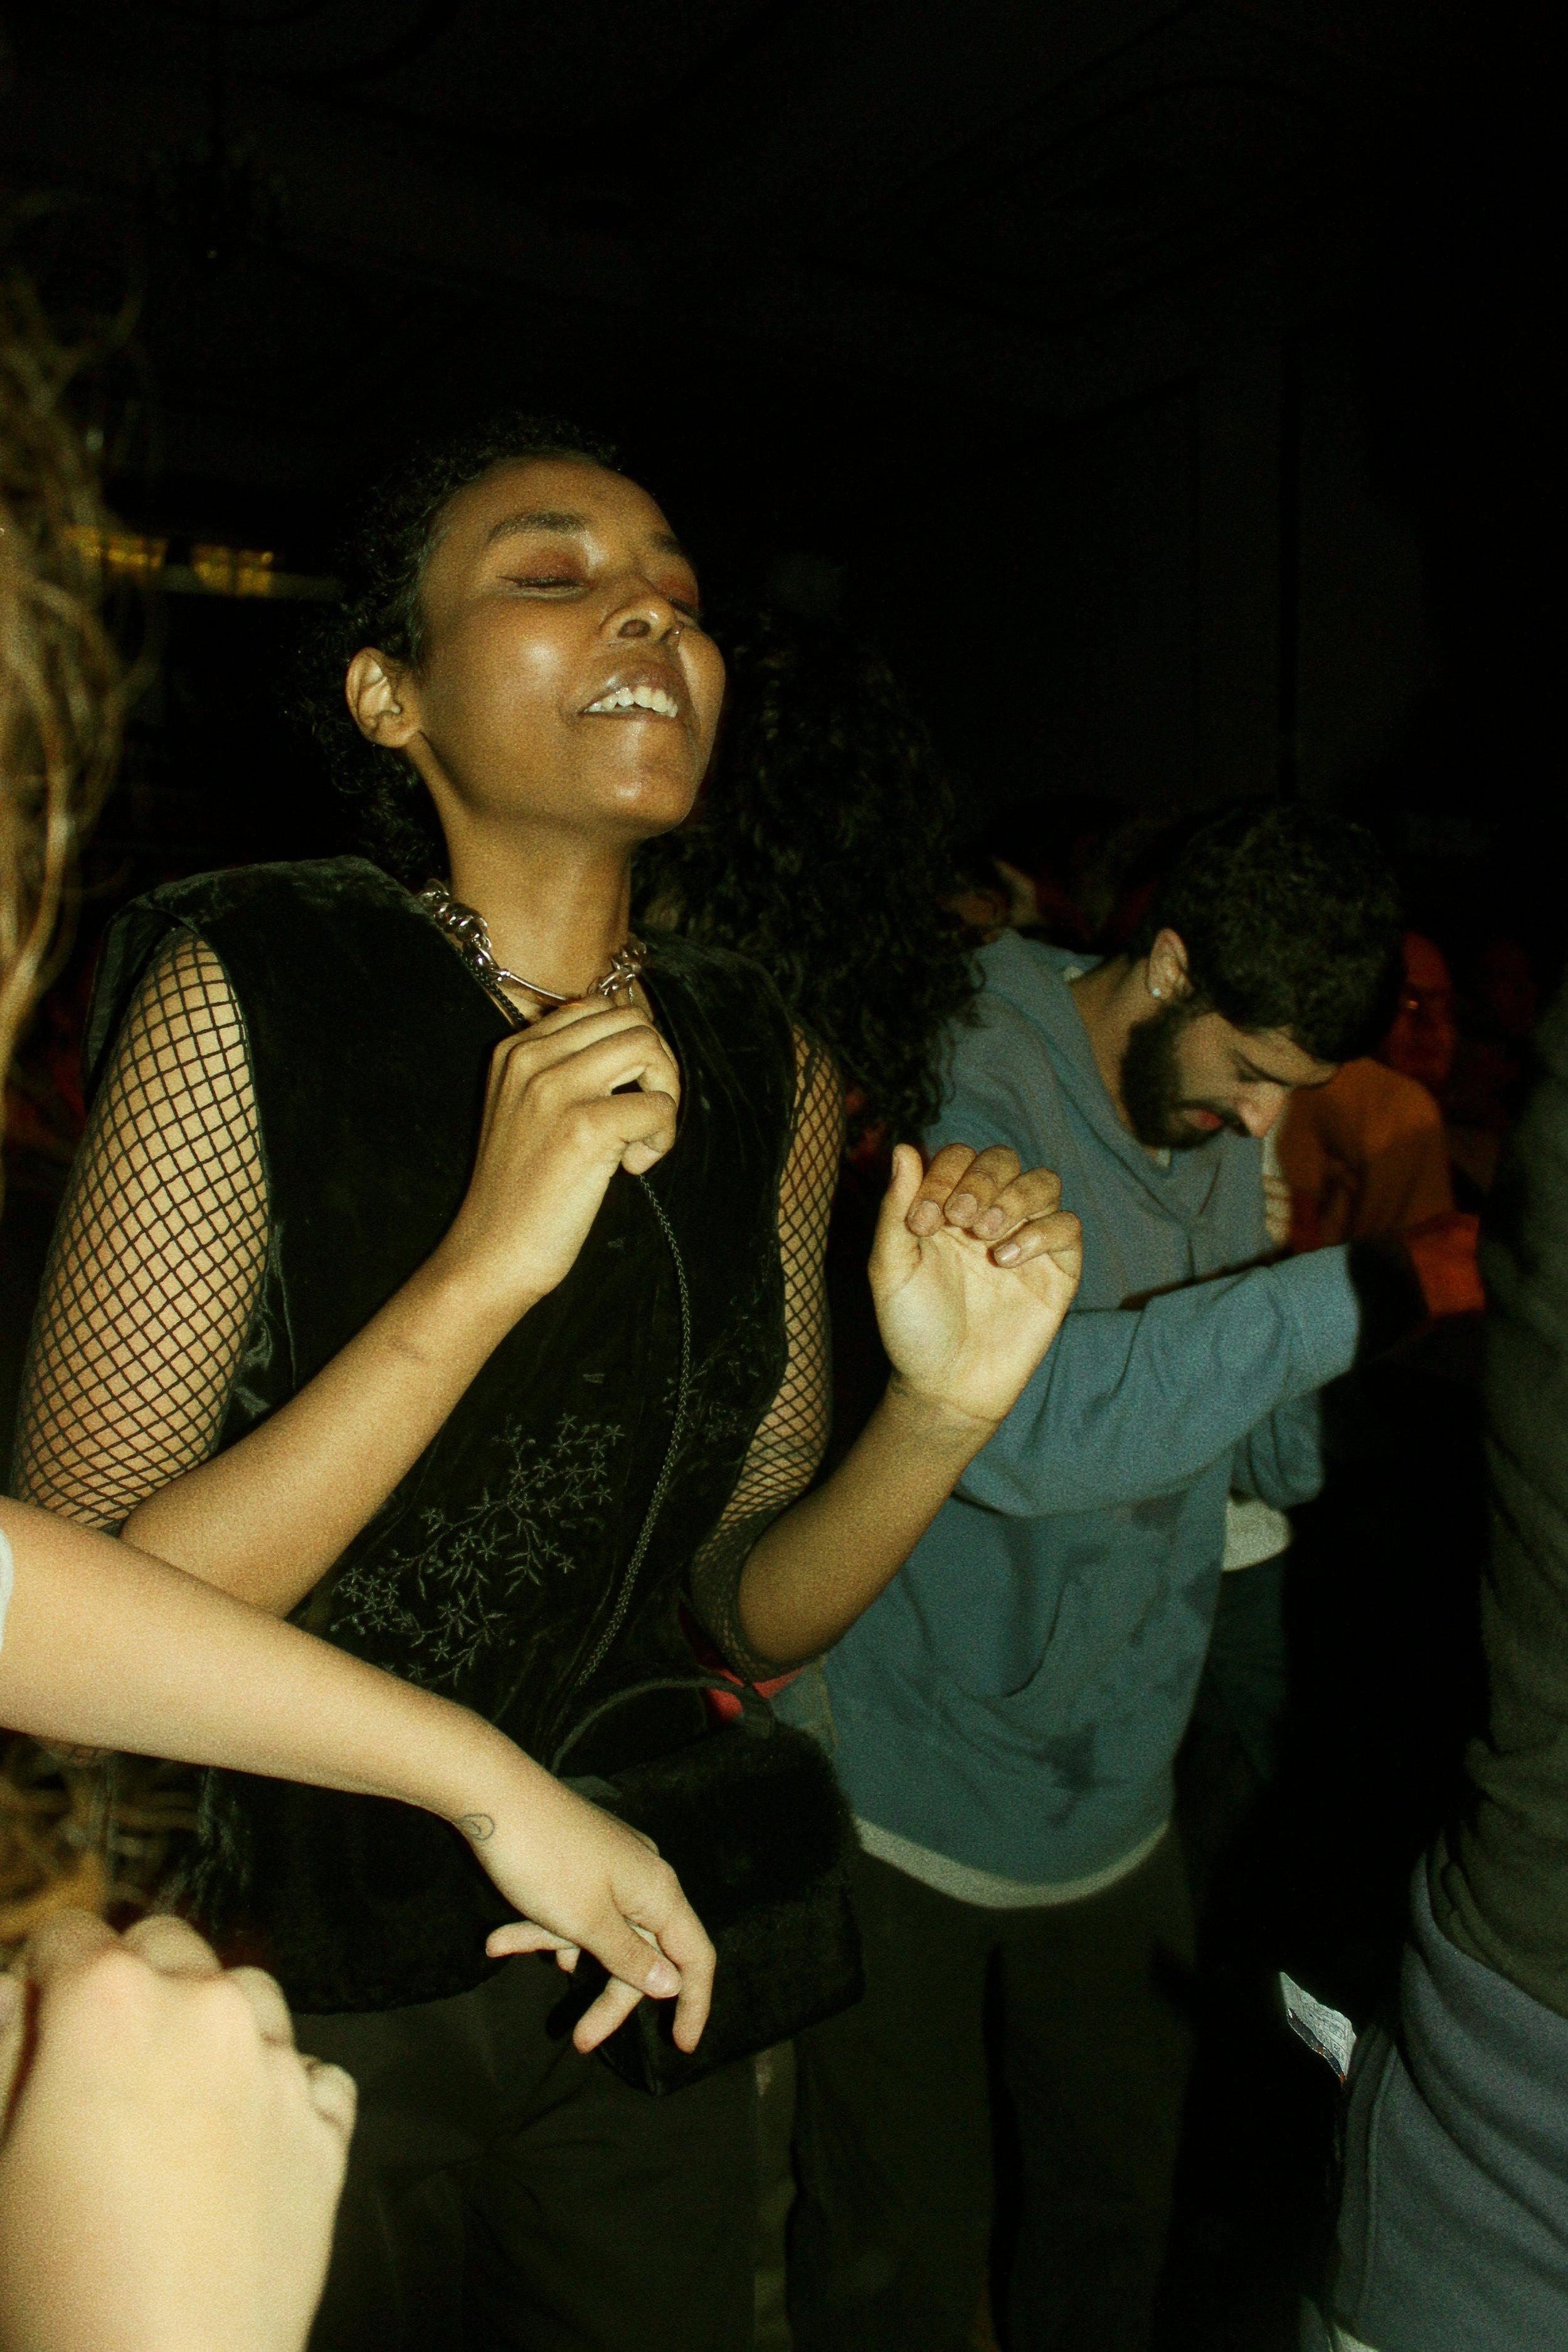 dancing girl, warsaw brooklyn october 2017